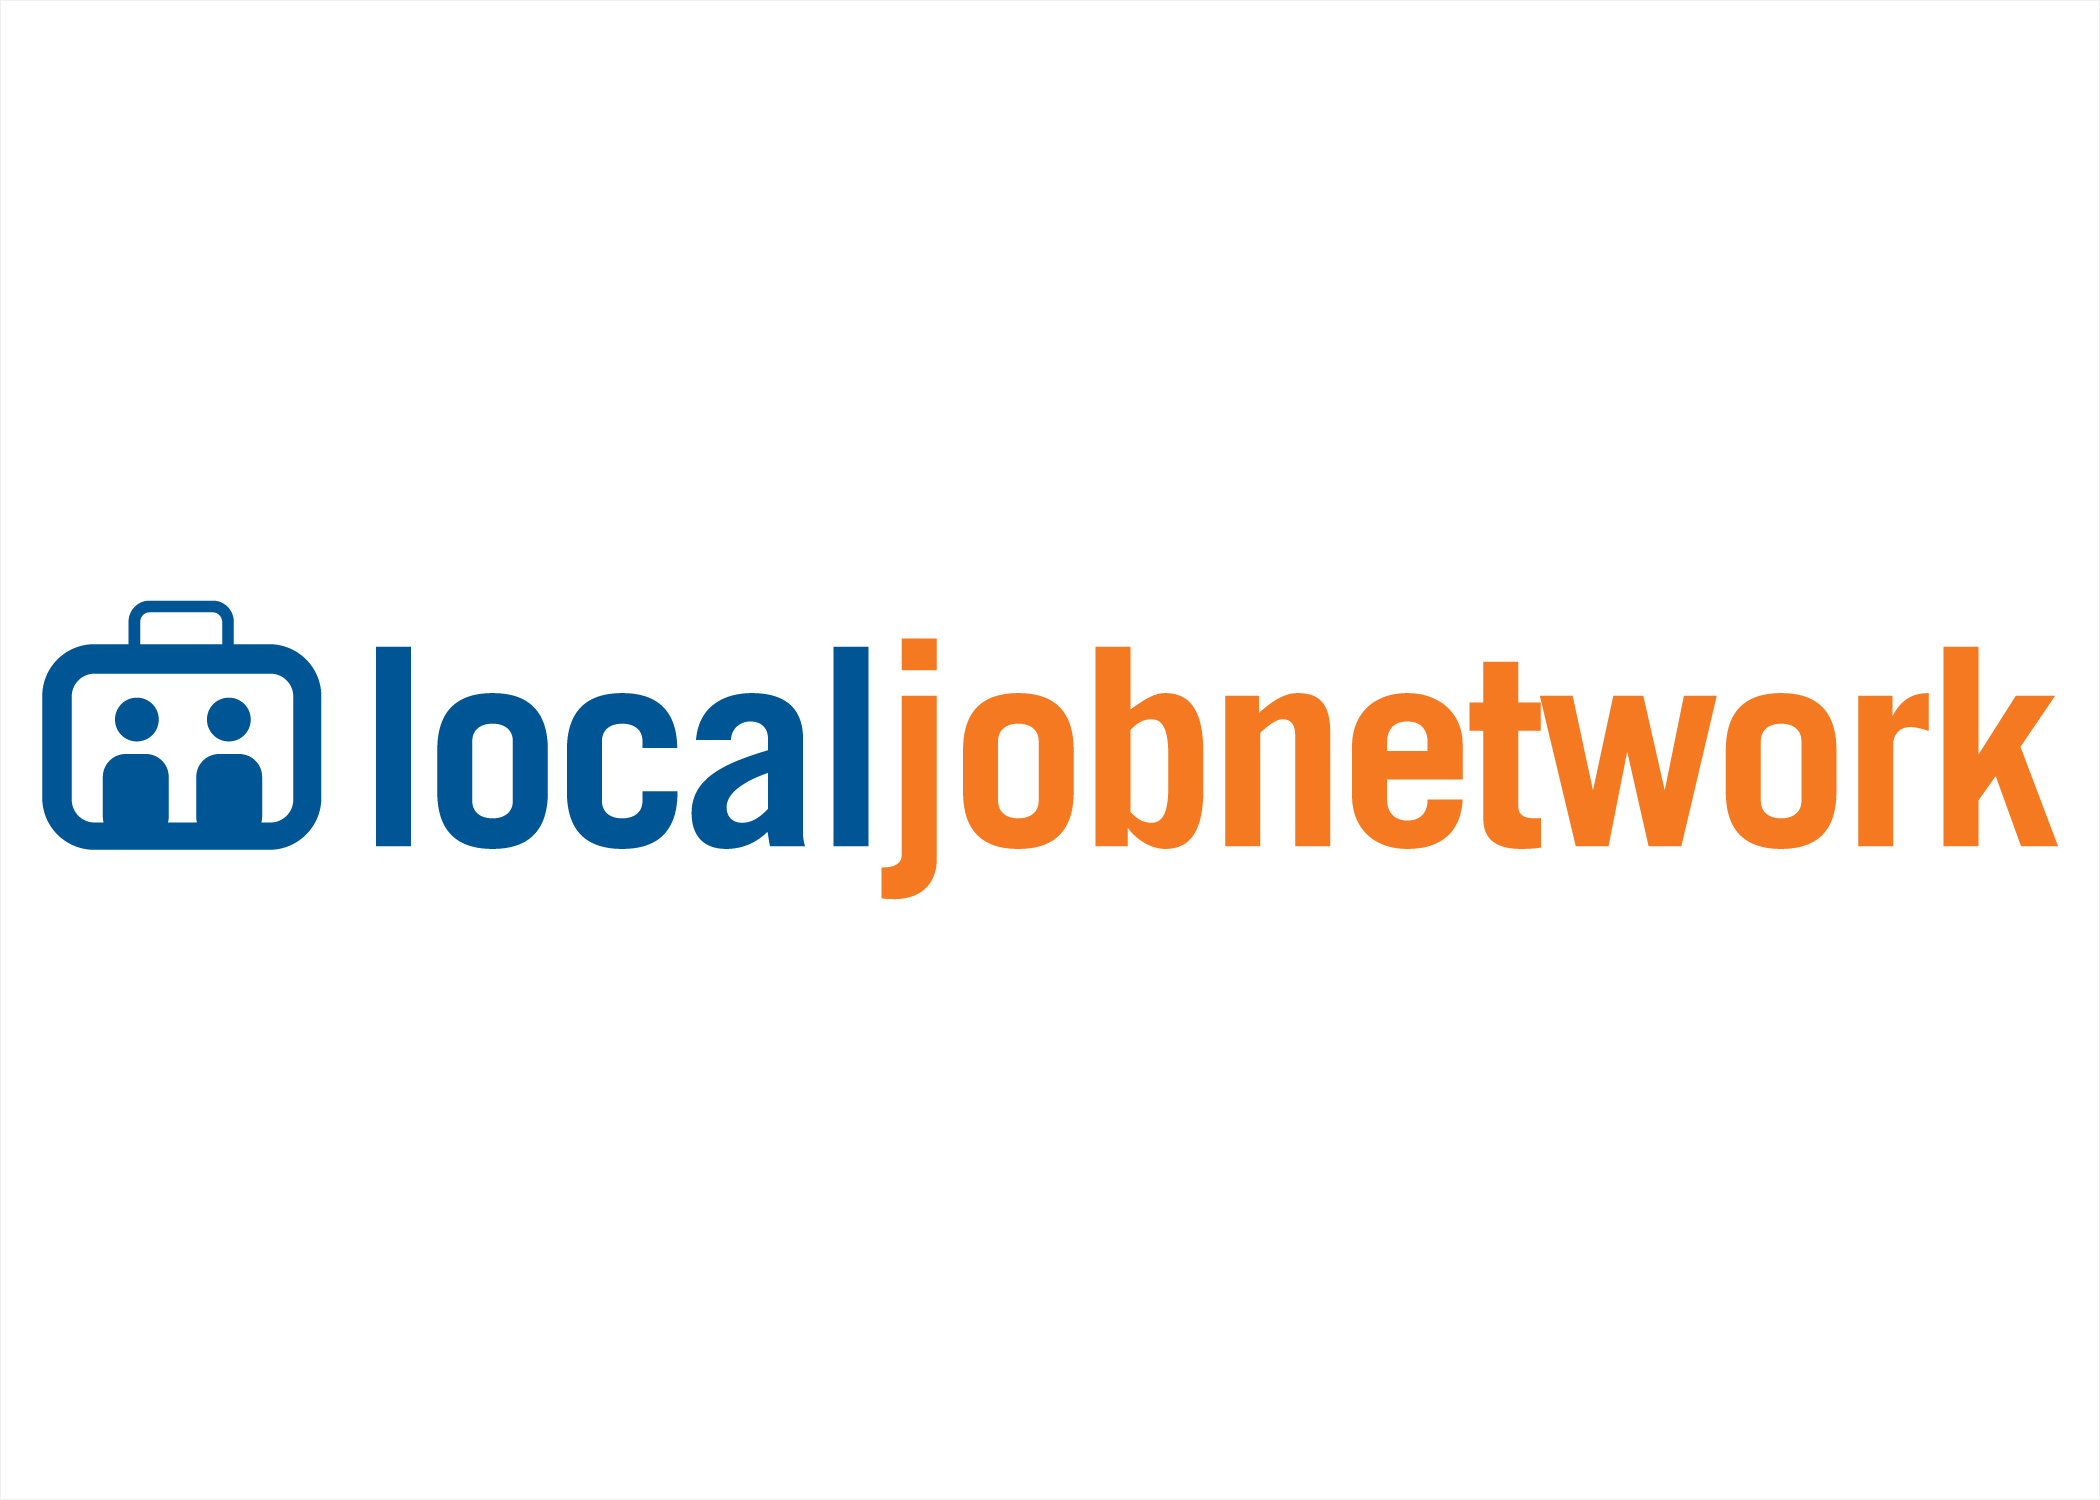 LocalJobNetwork